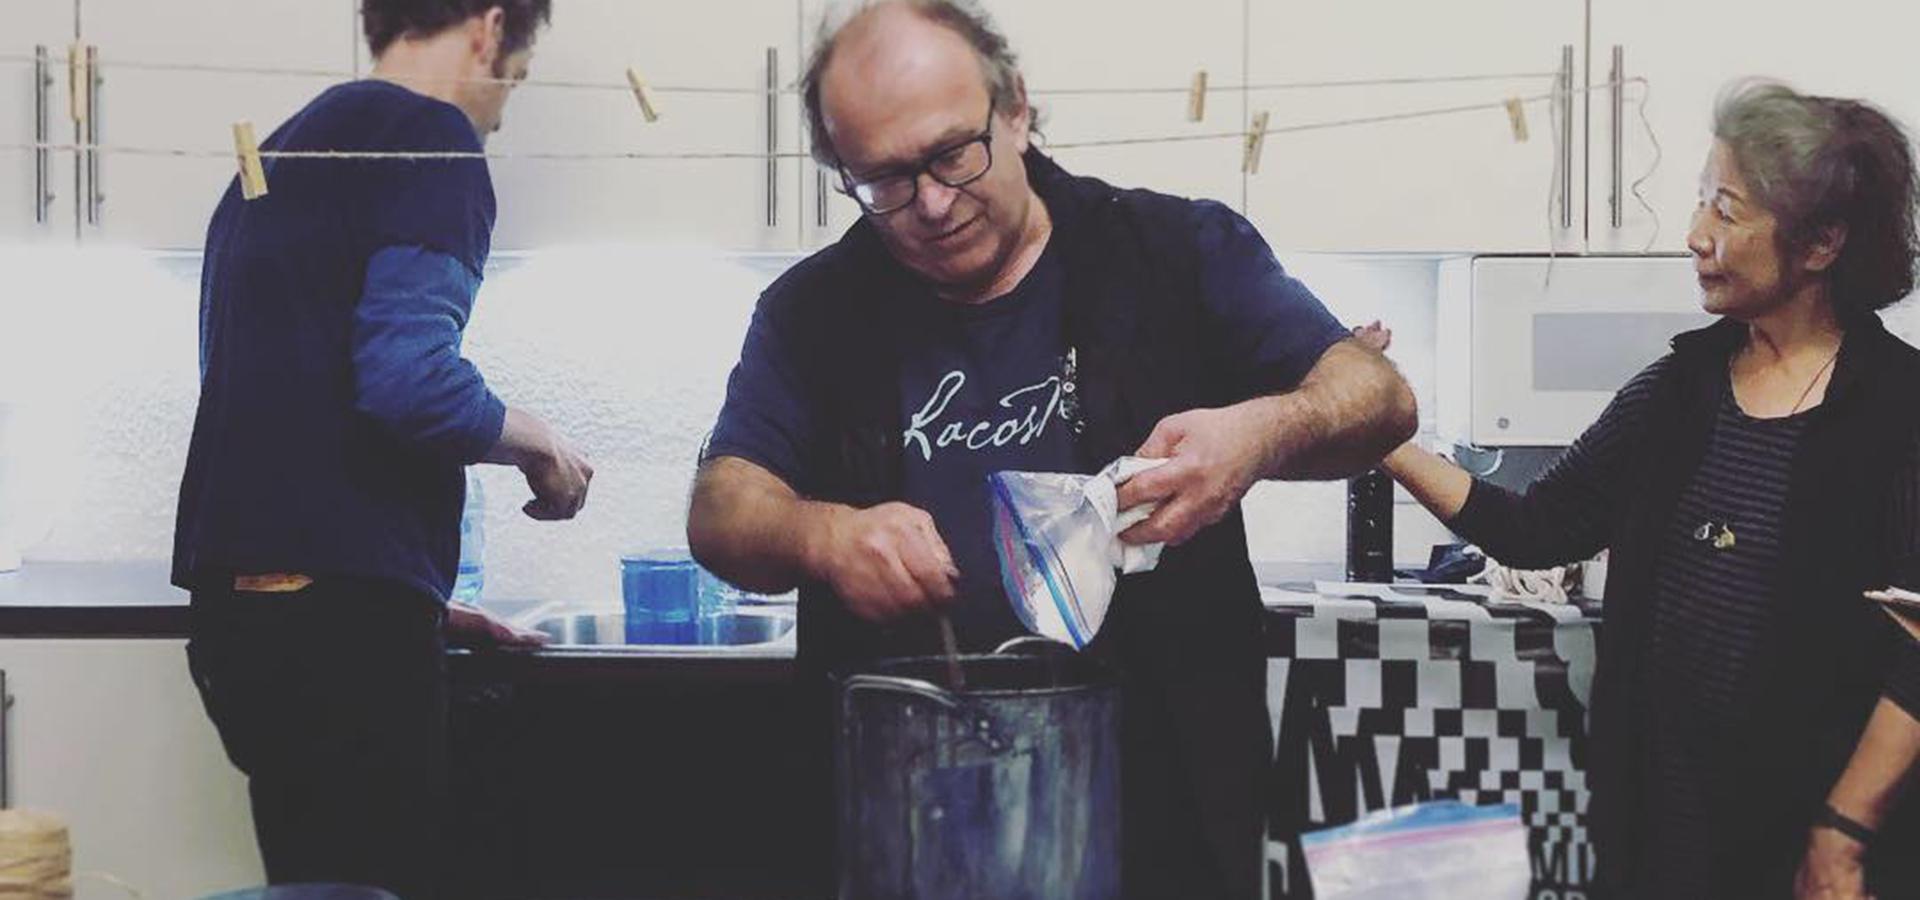 Guy mixing indigo paint for artist workshop